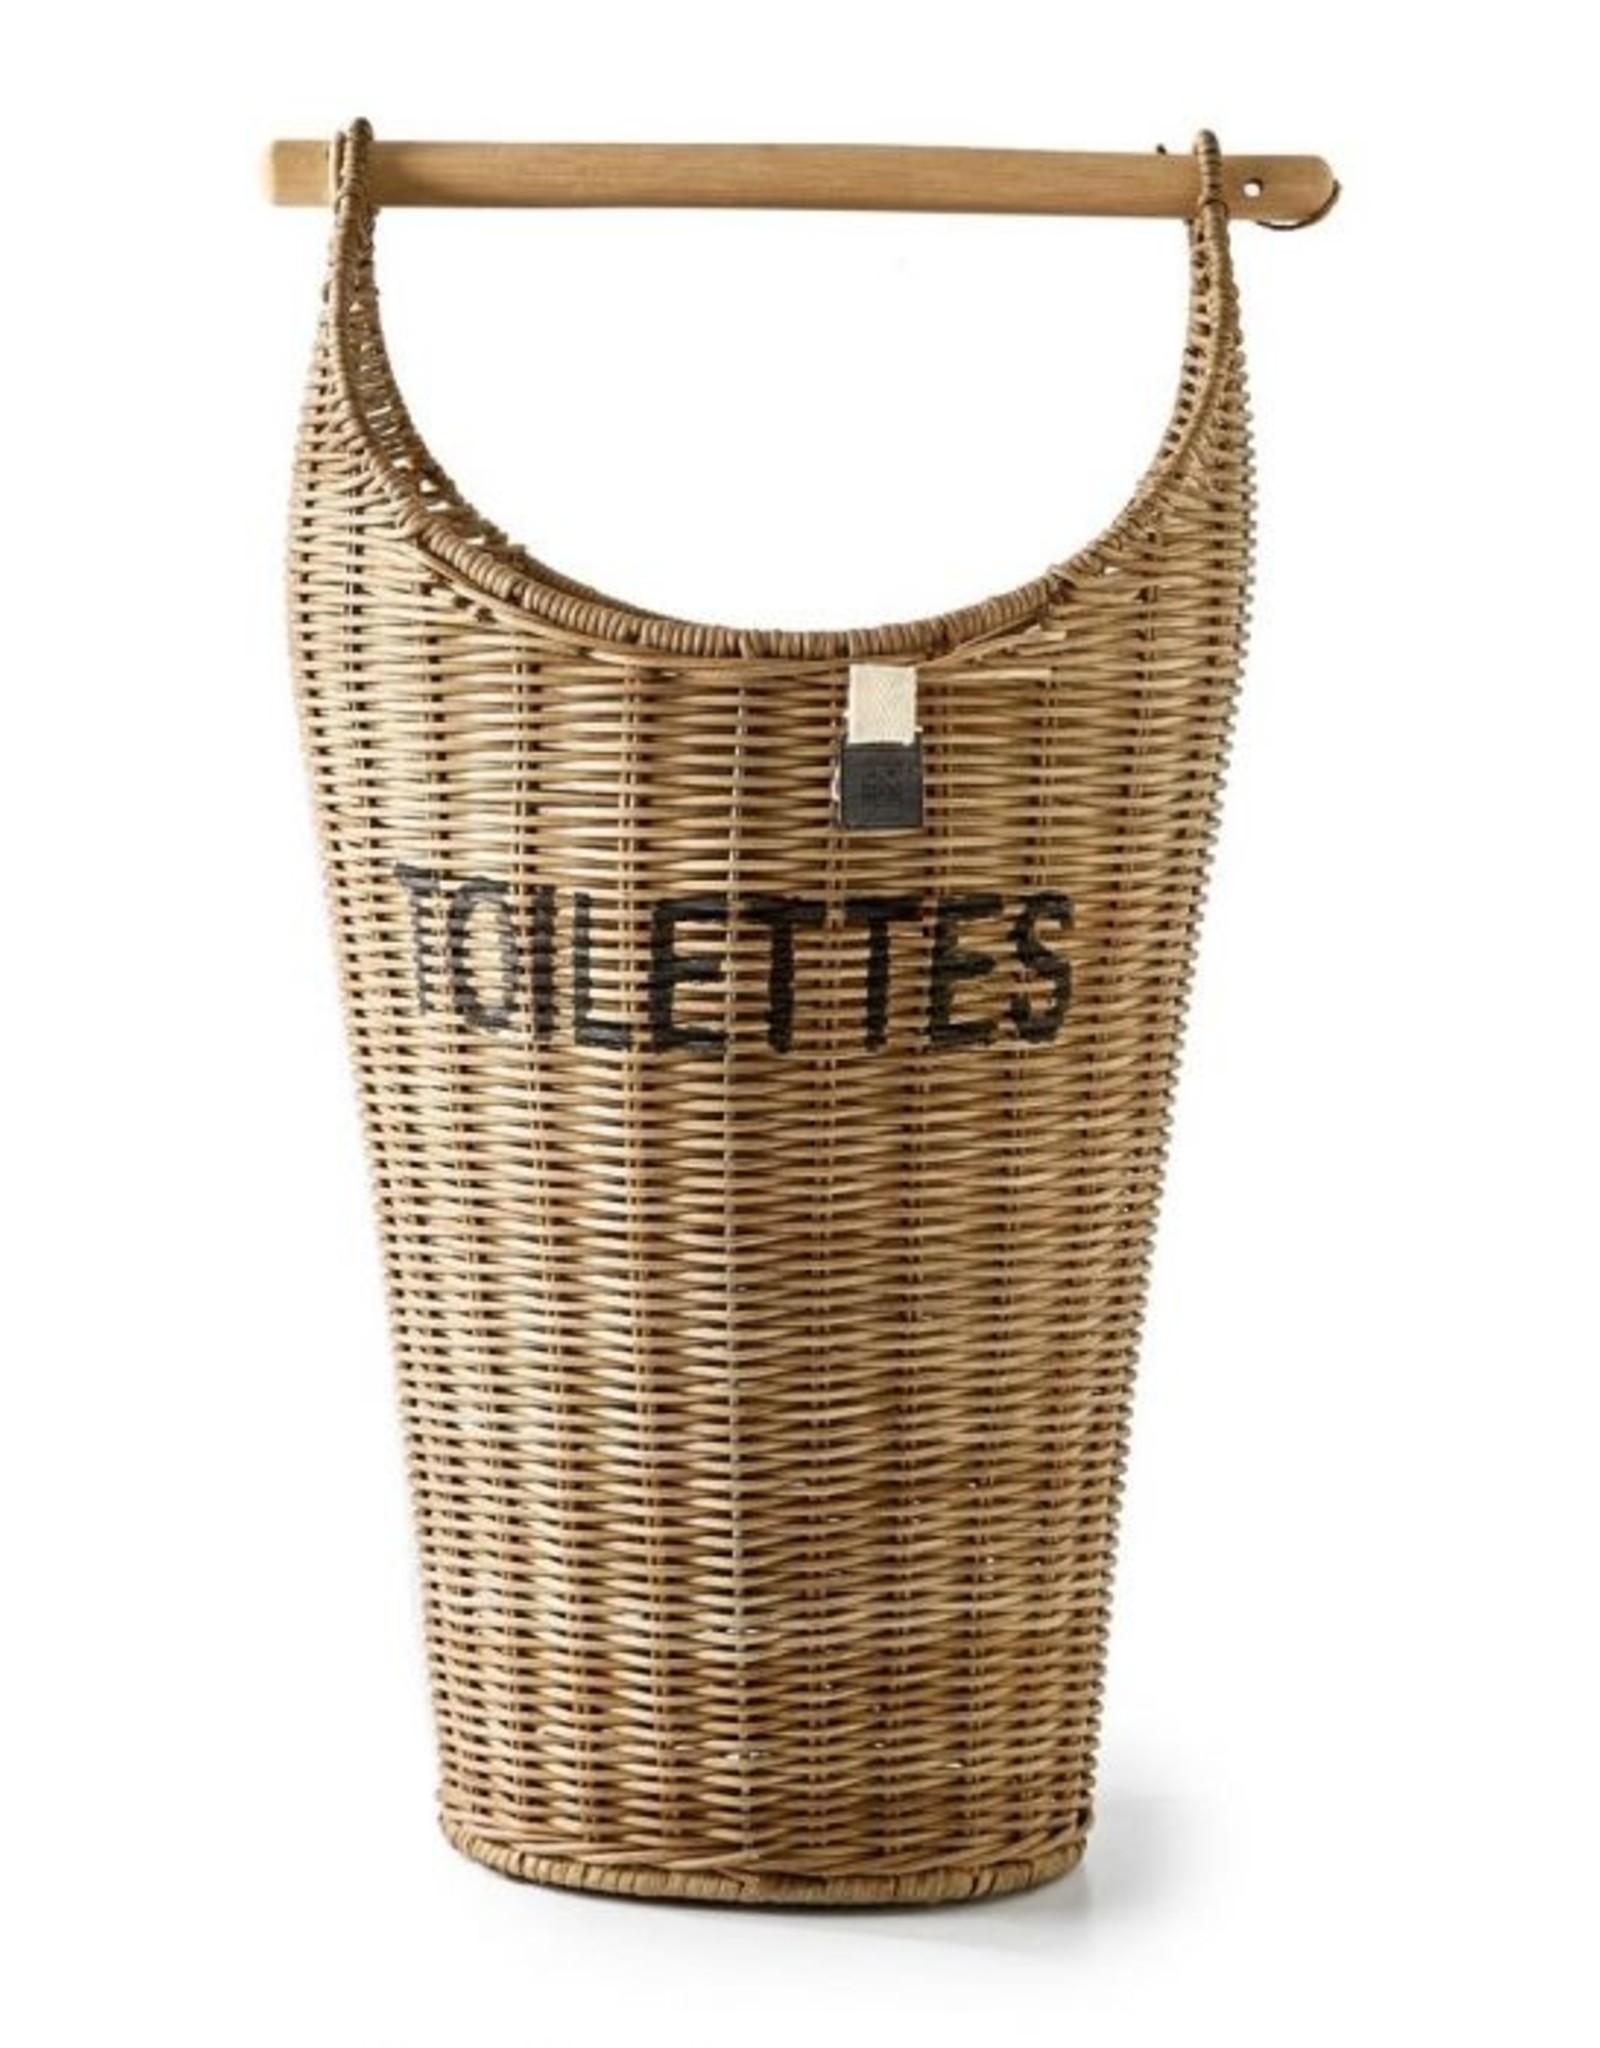 Riviera Maison Rustic Rattan Toilettes Basket